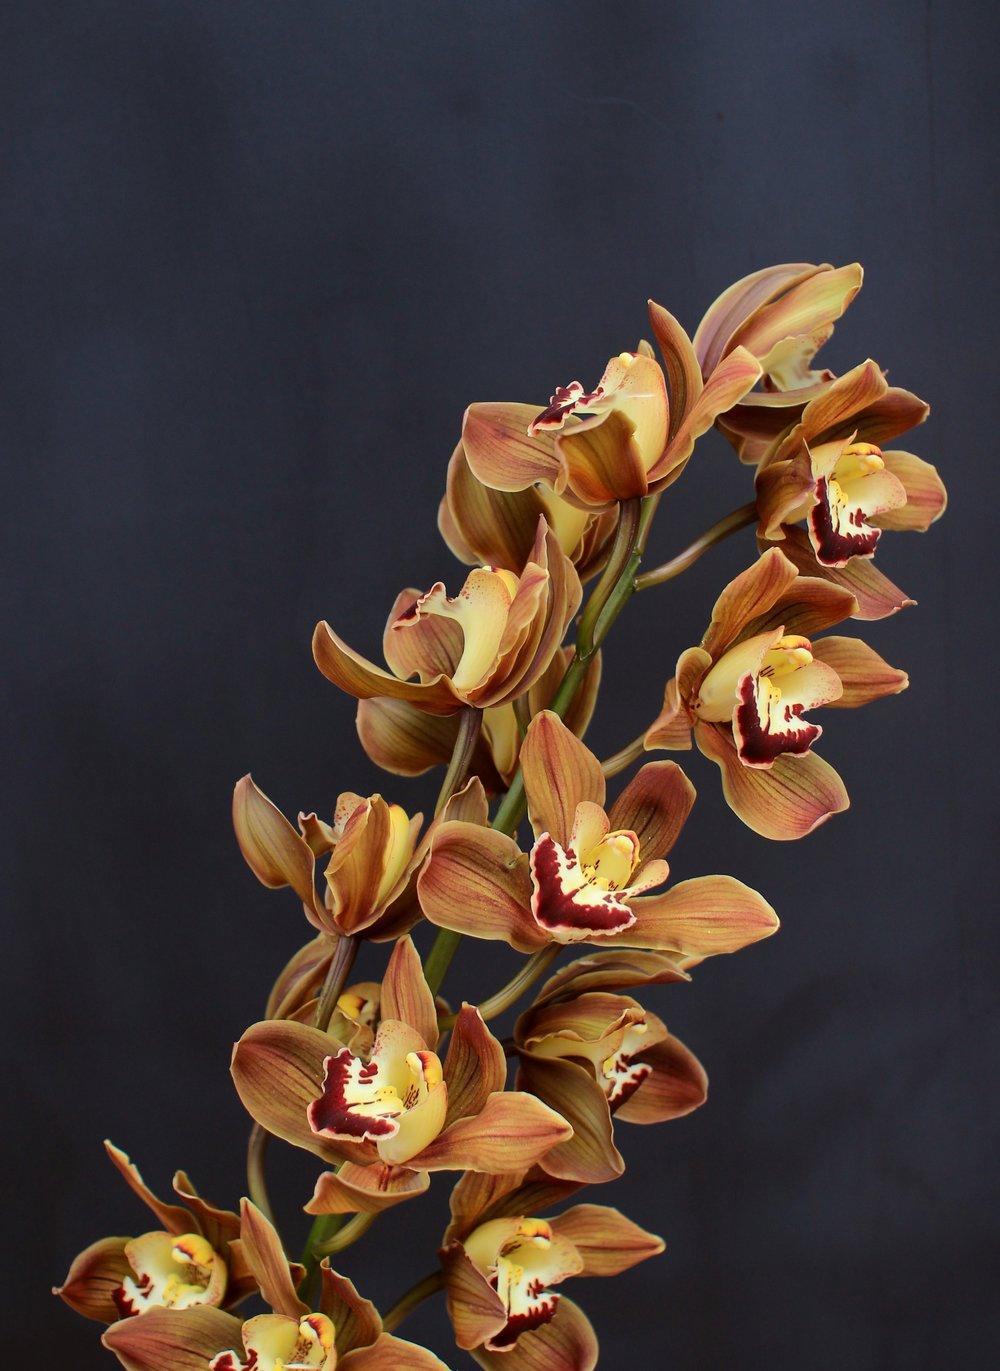 CYMBIDIUM ORCHID, chocolate brown